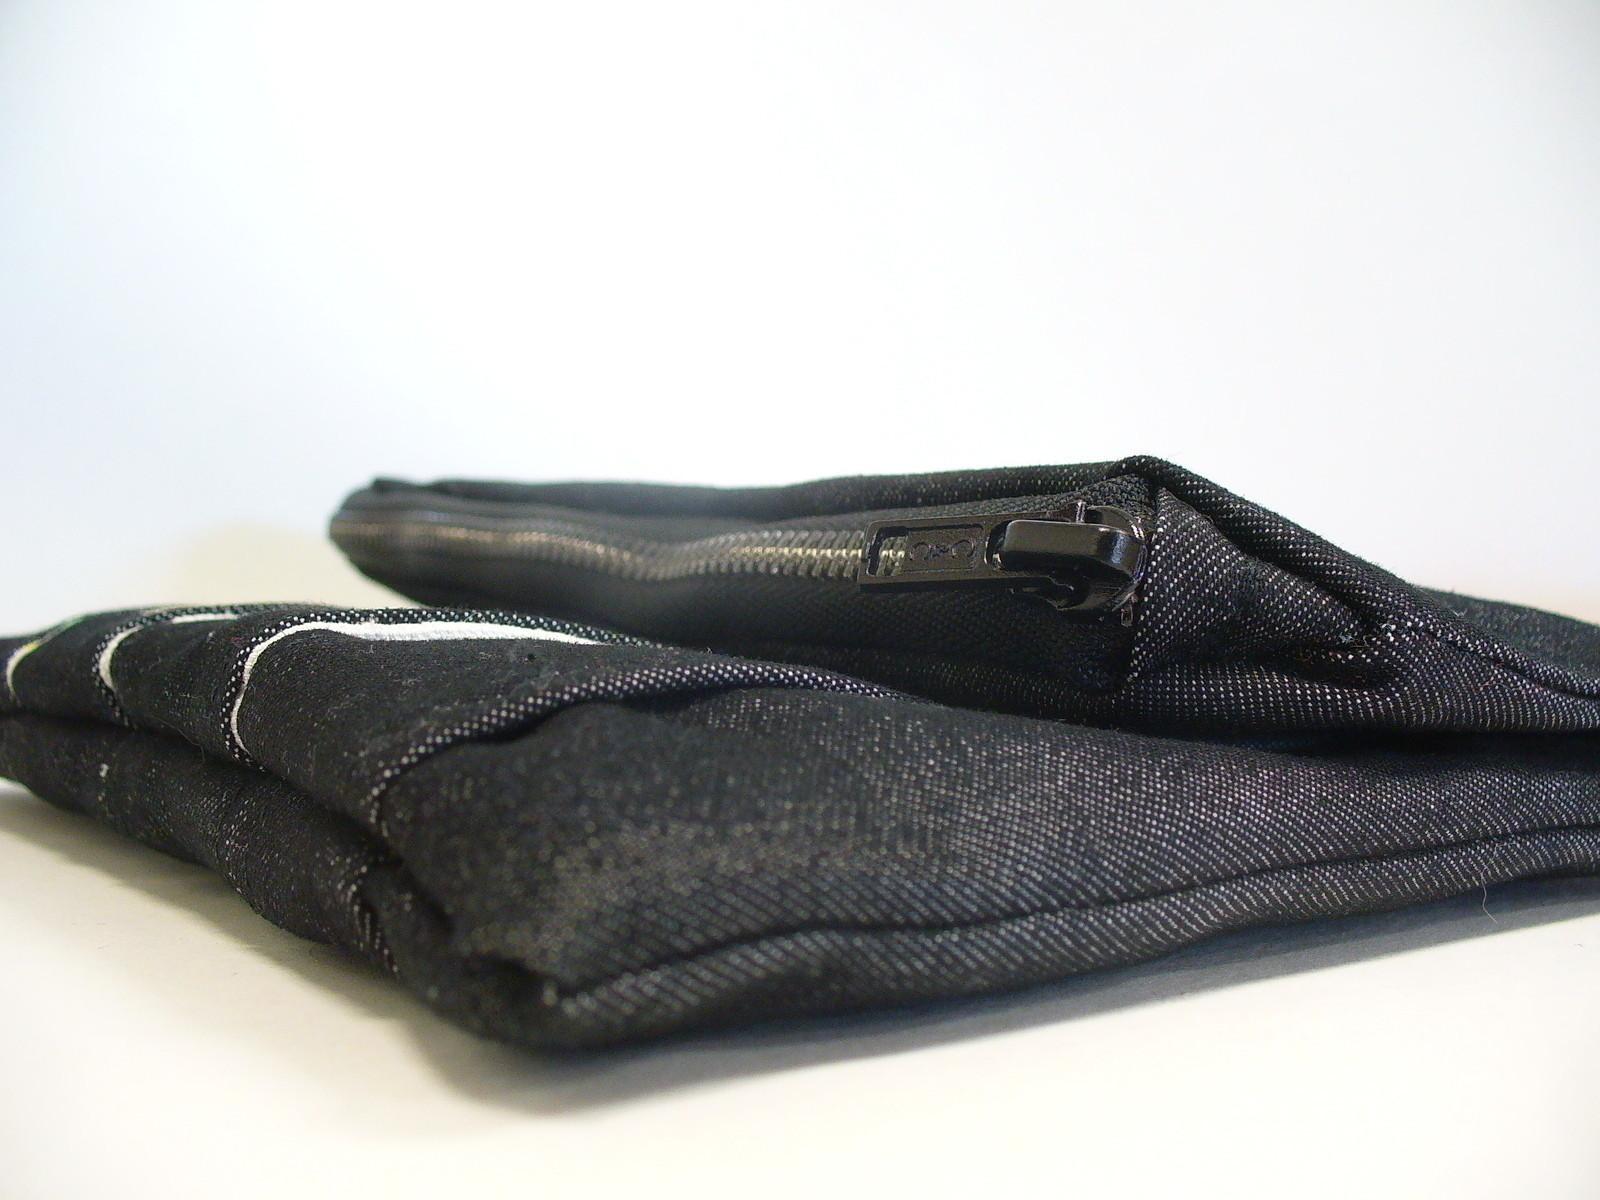 Puffy Side Pocket Clutch A Zipper Pouch Needlework On